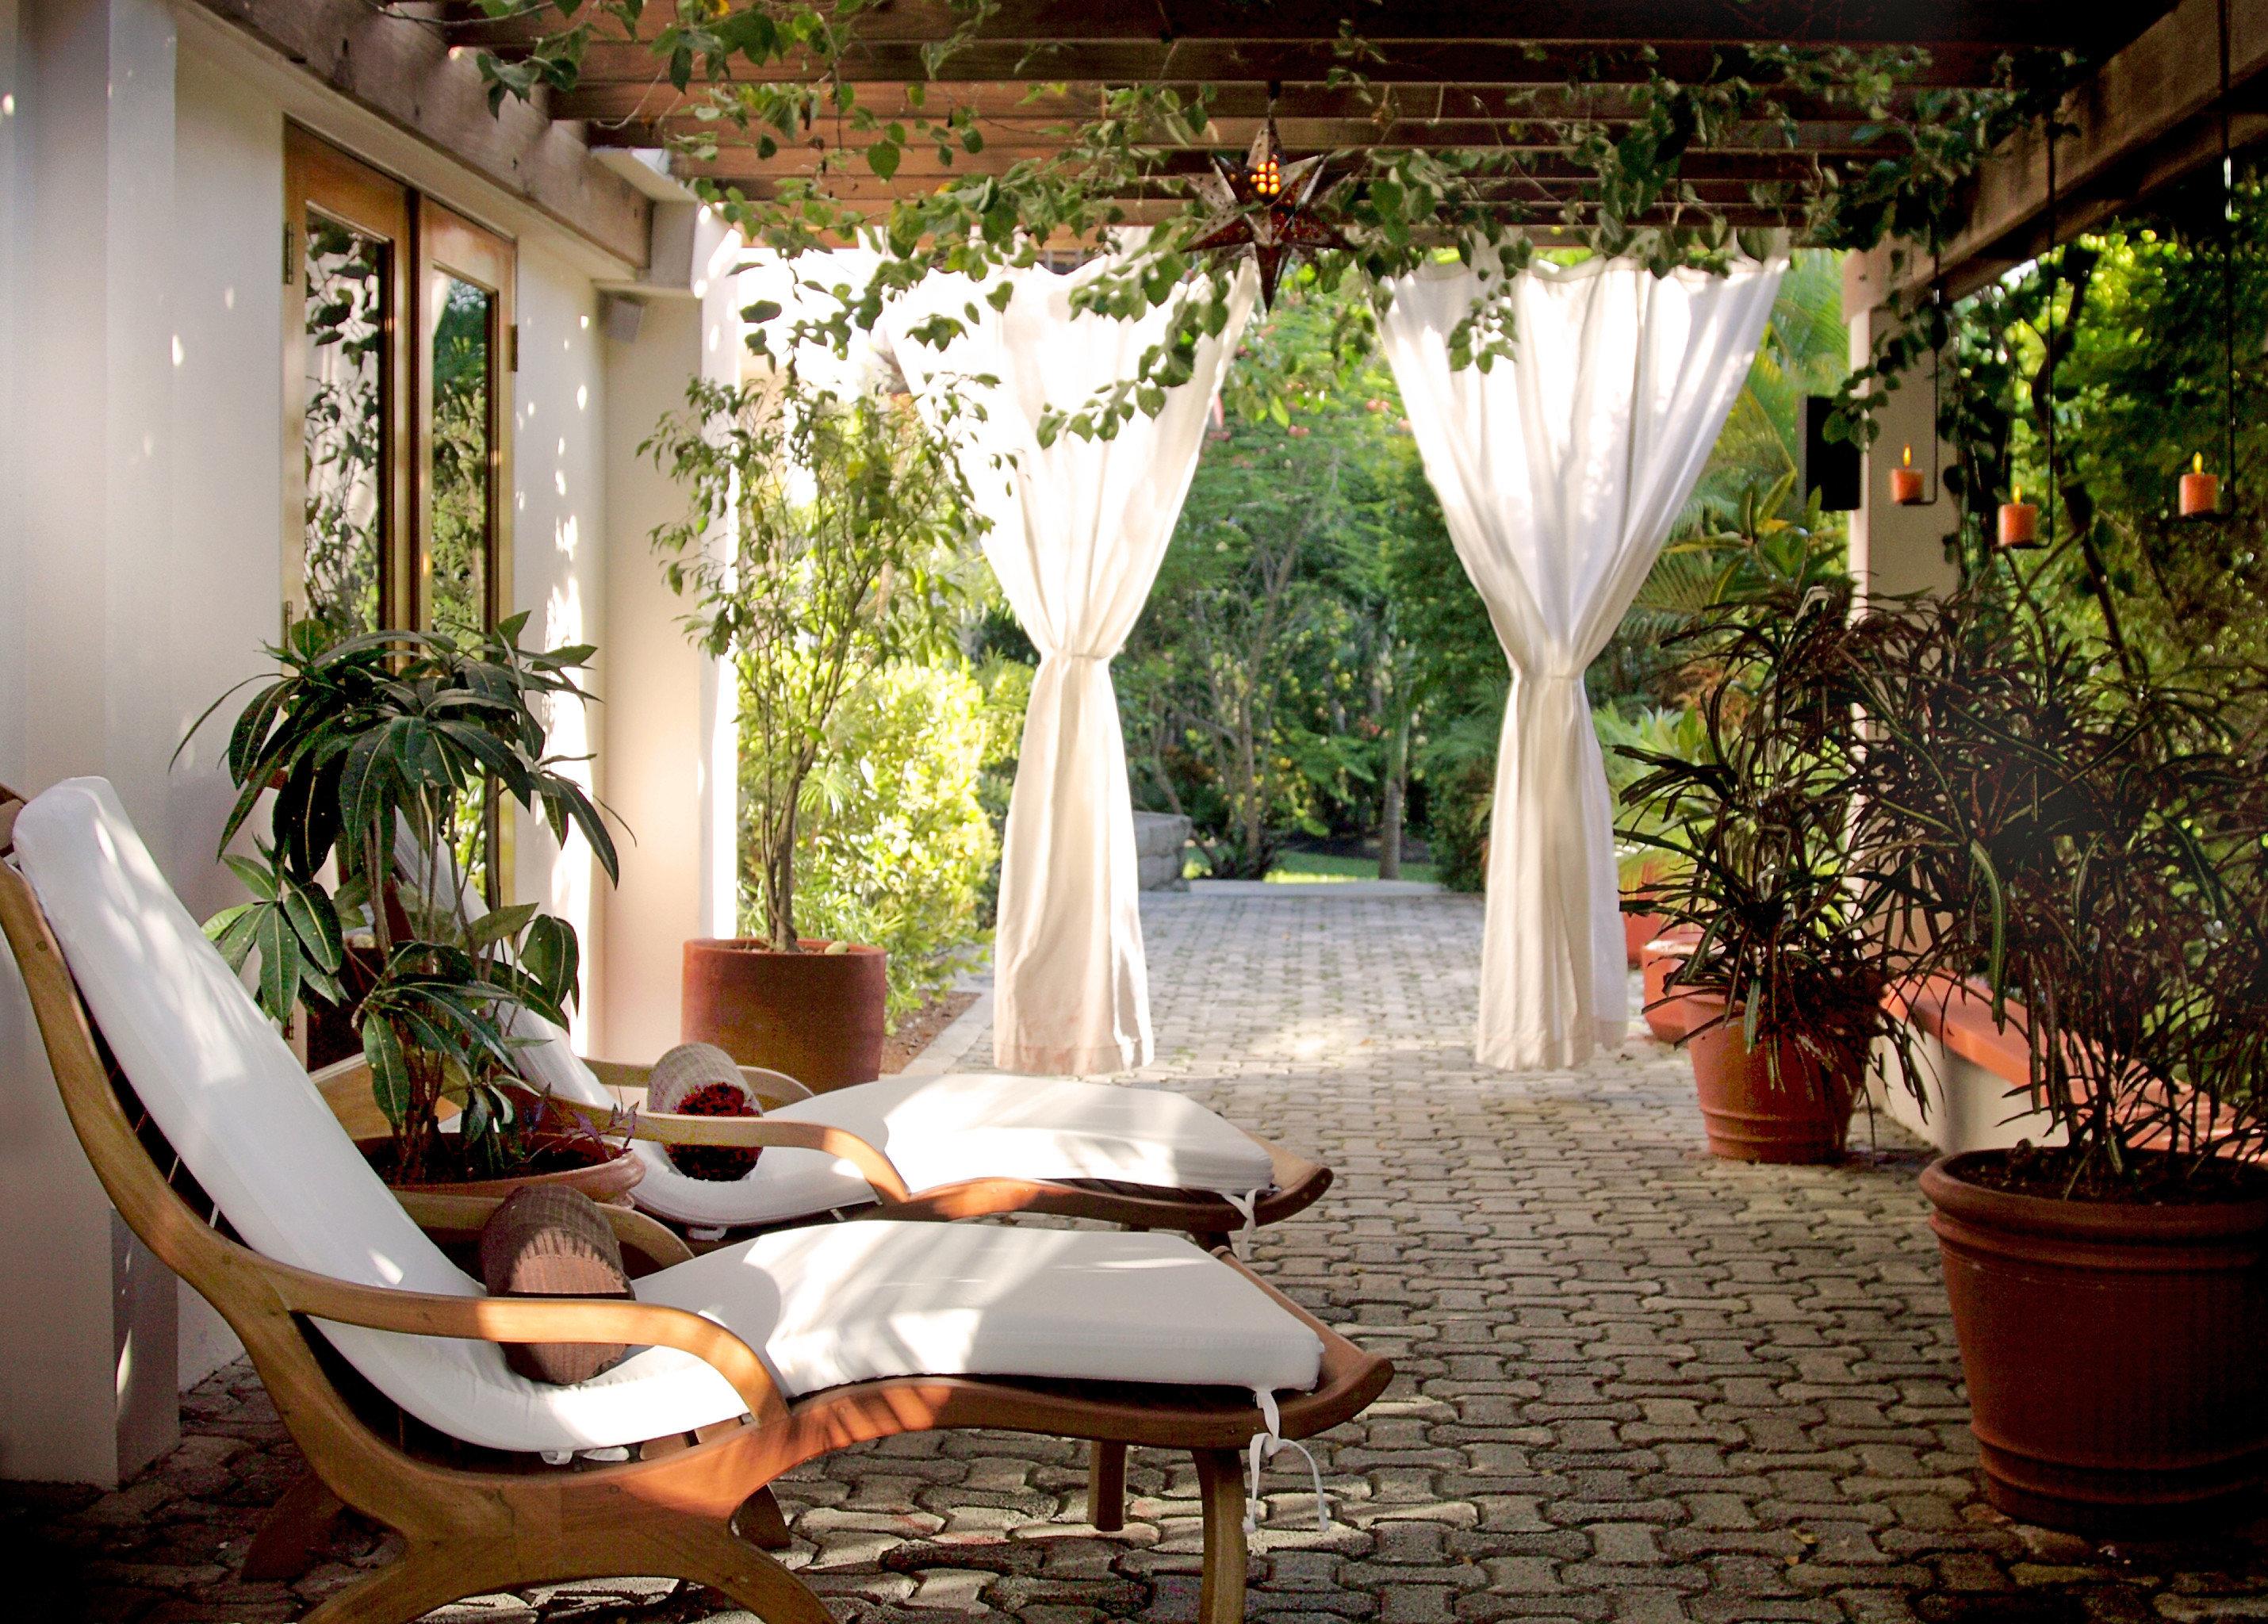 Boutique Hotels Patio Resort Romance Romantic room interior design estate home furniture cottage backyard decorated several